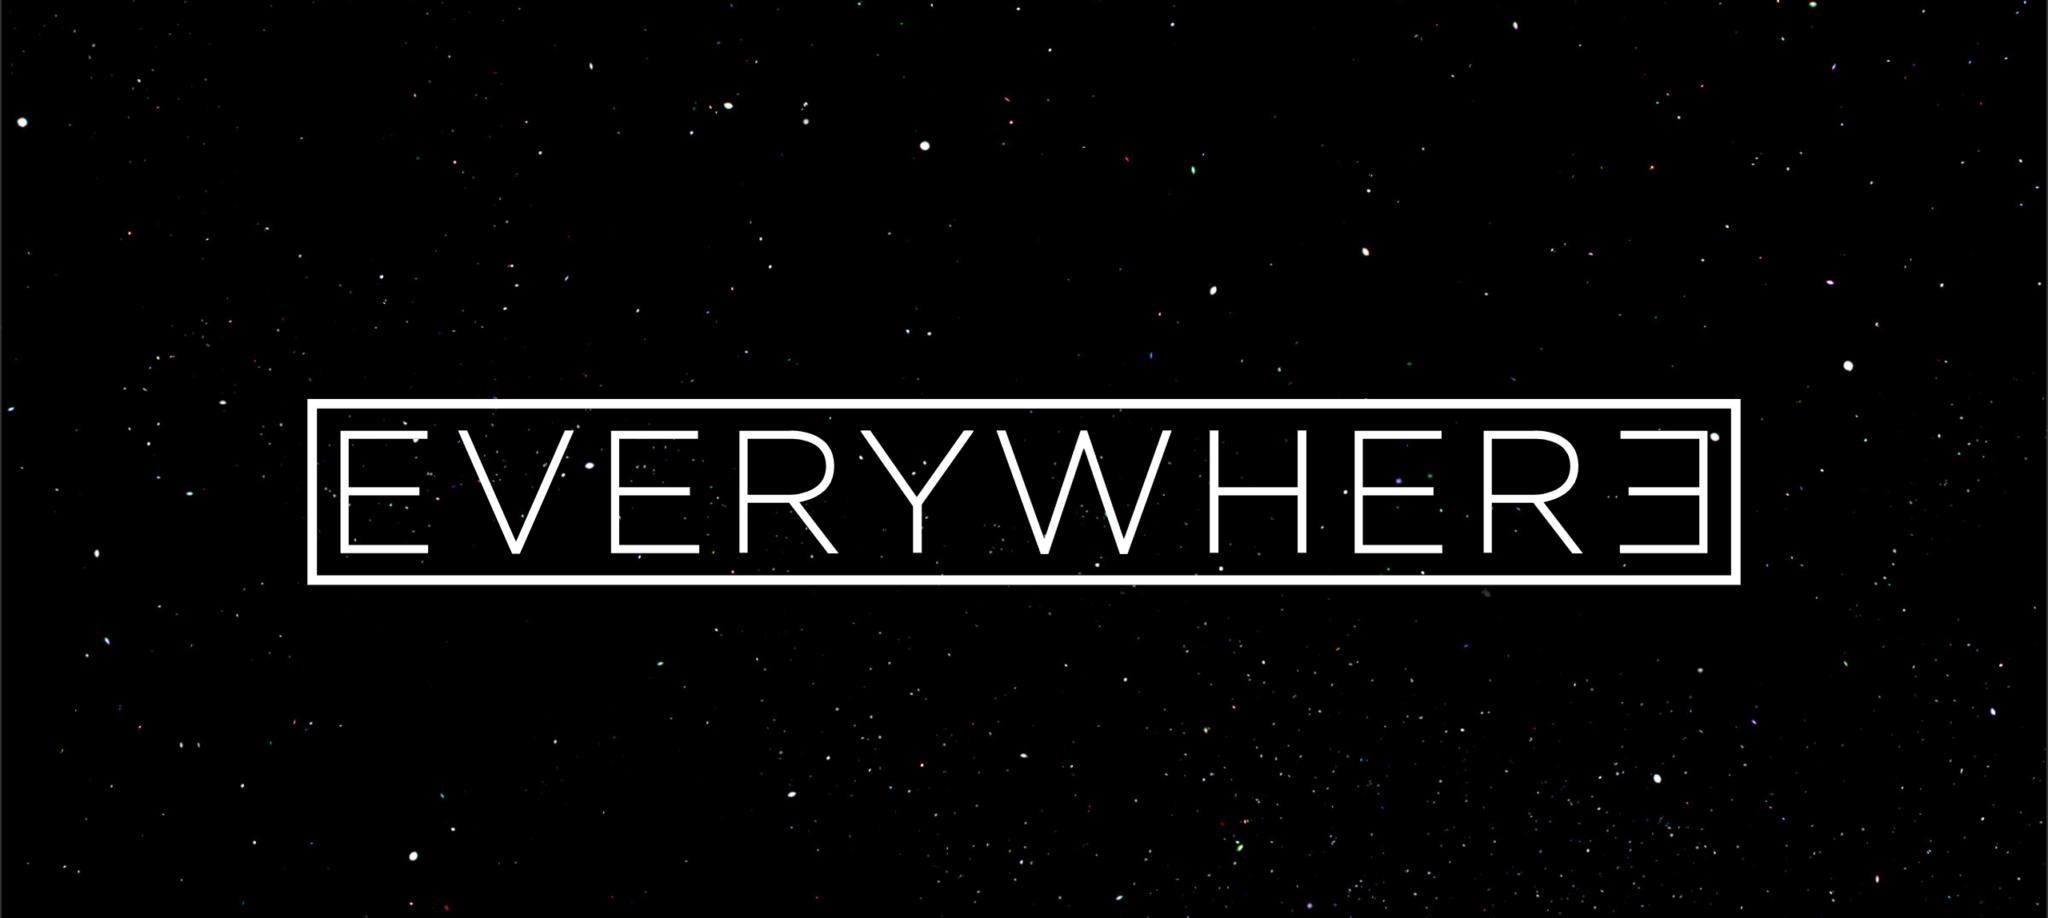 Everywhere logo